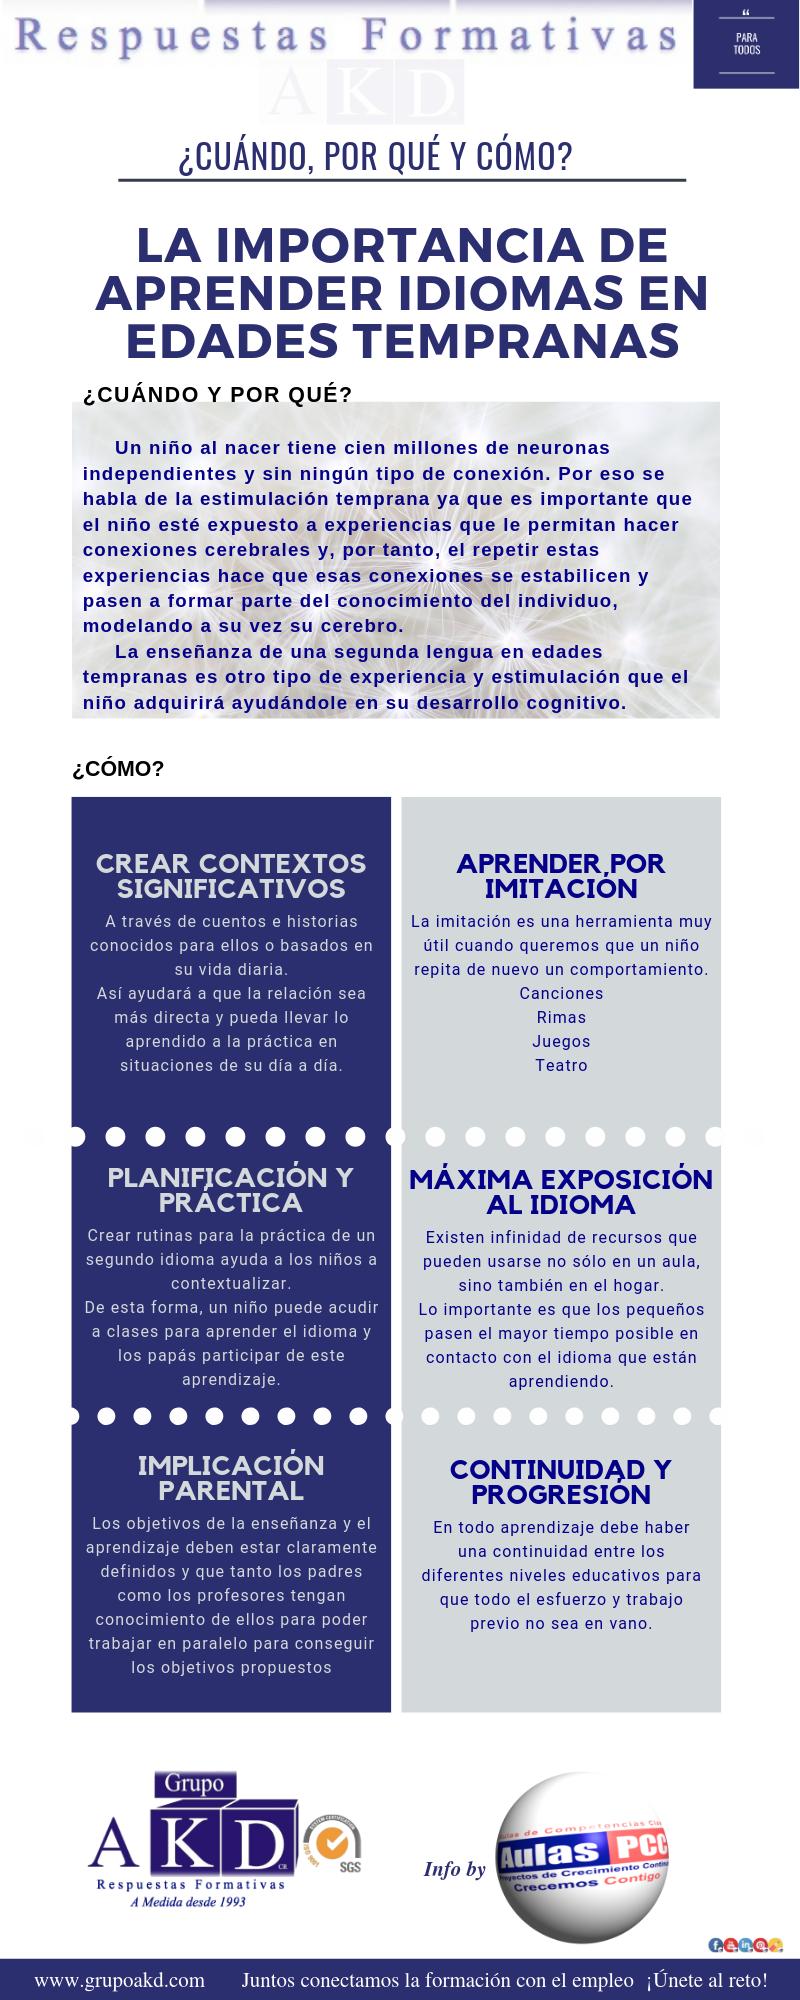 INFOGRAFIA Importancia Aprender Edades Tempranas.png